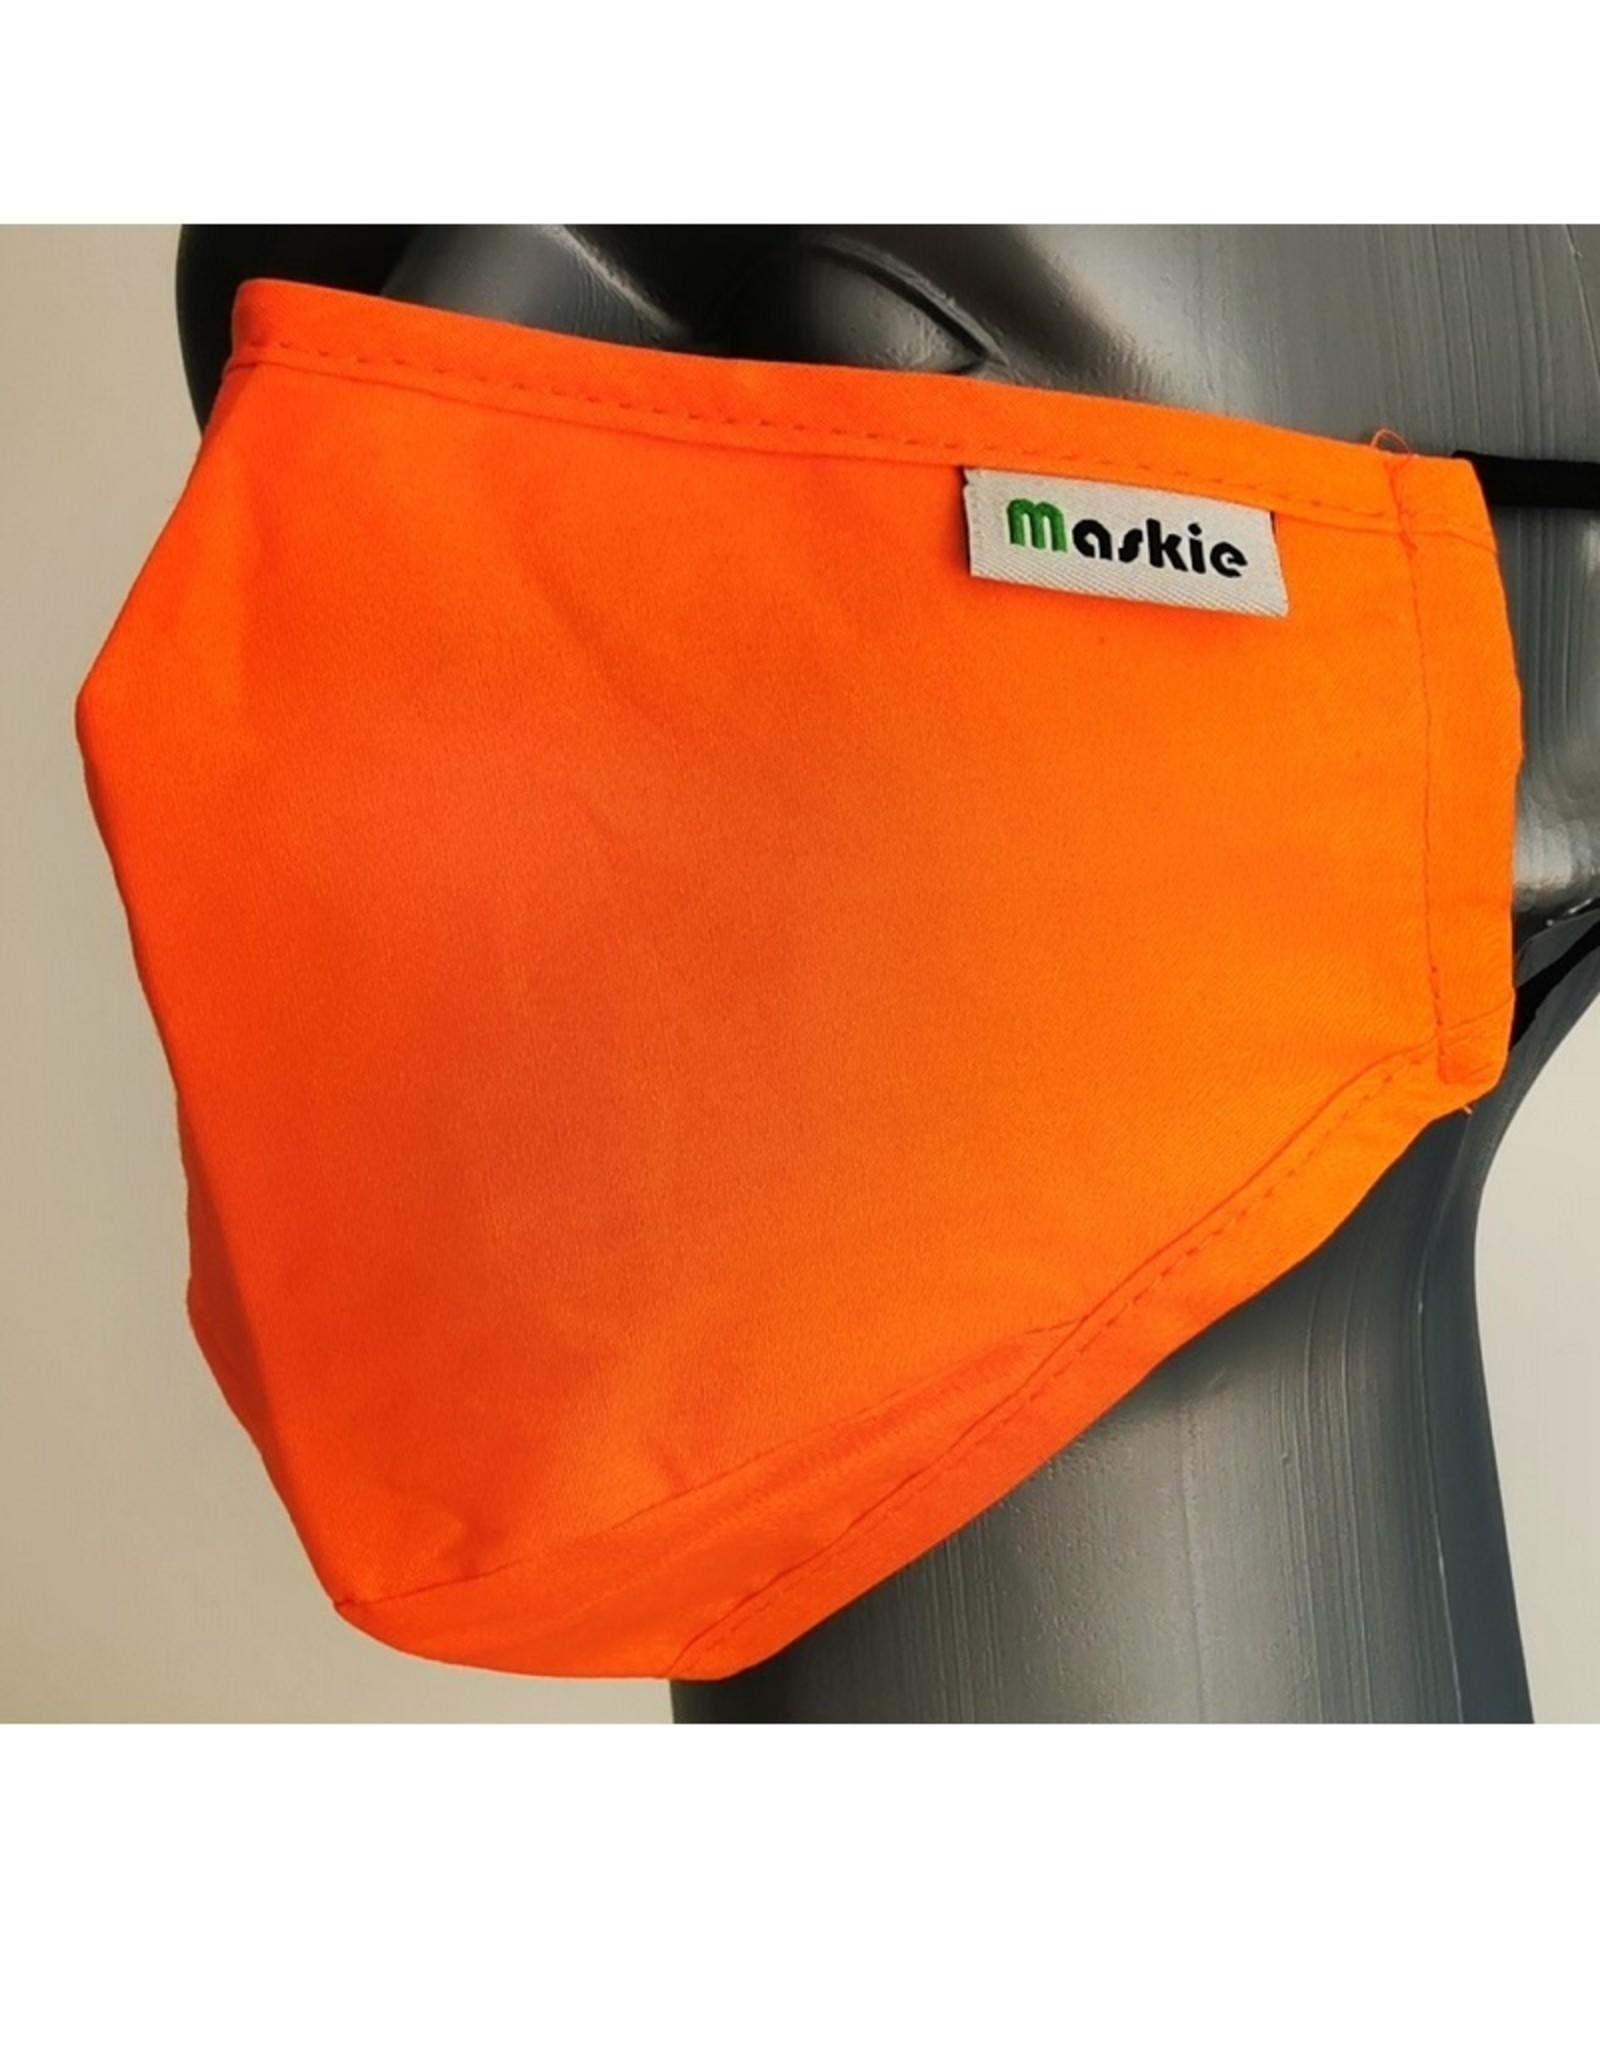 Maskie mondkapje: Effen oranje